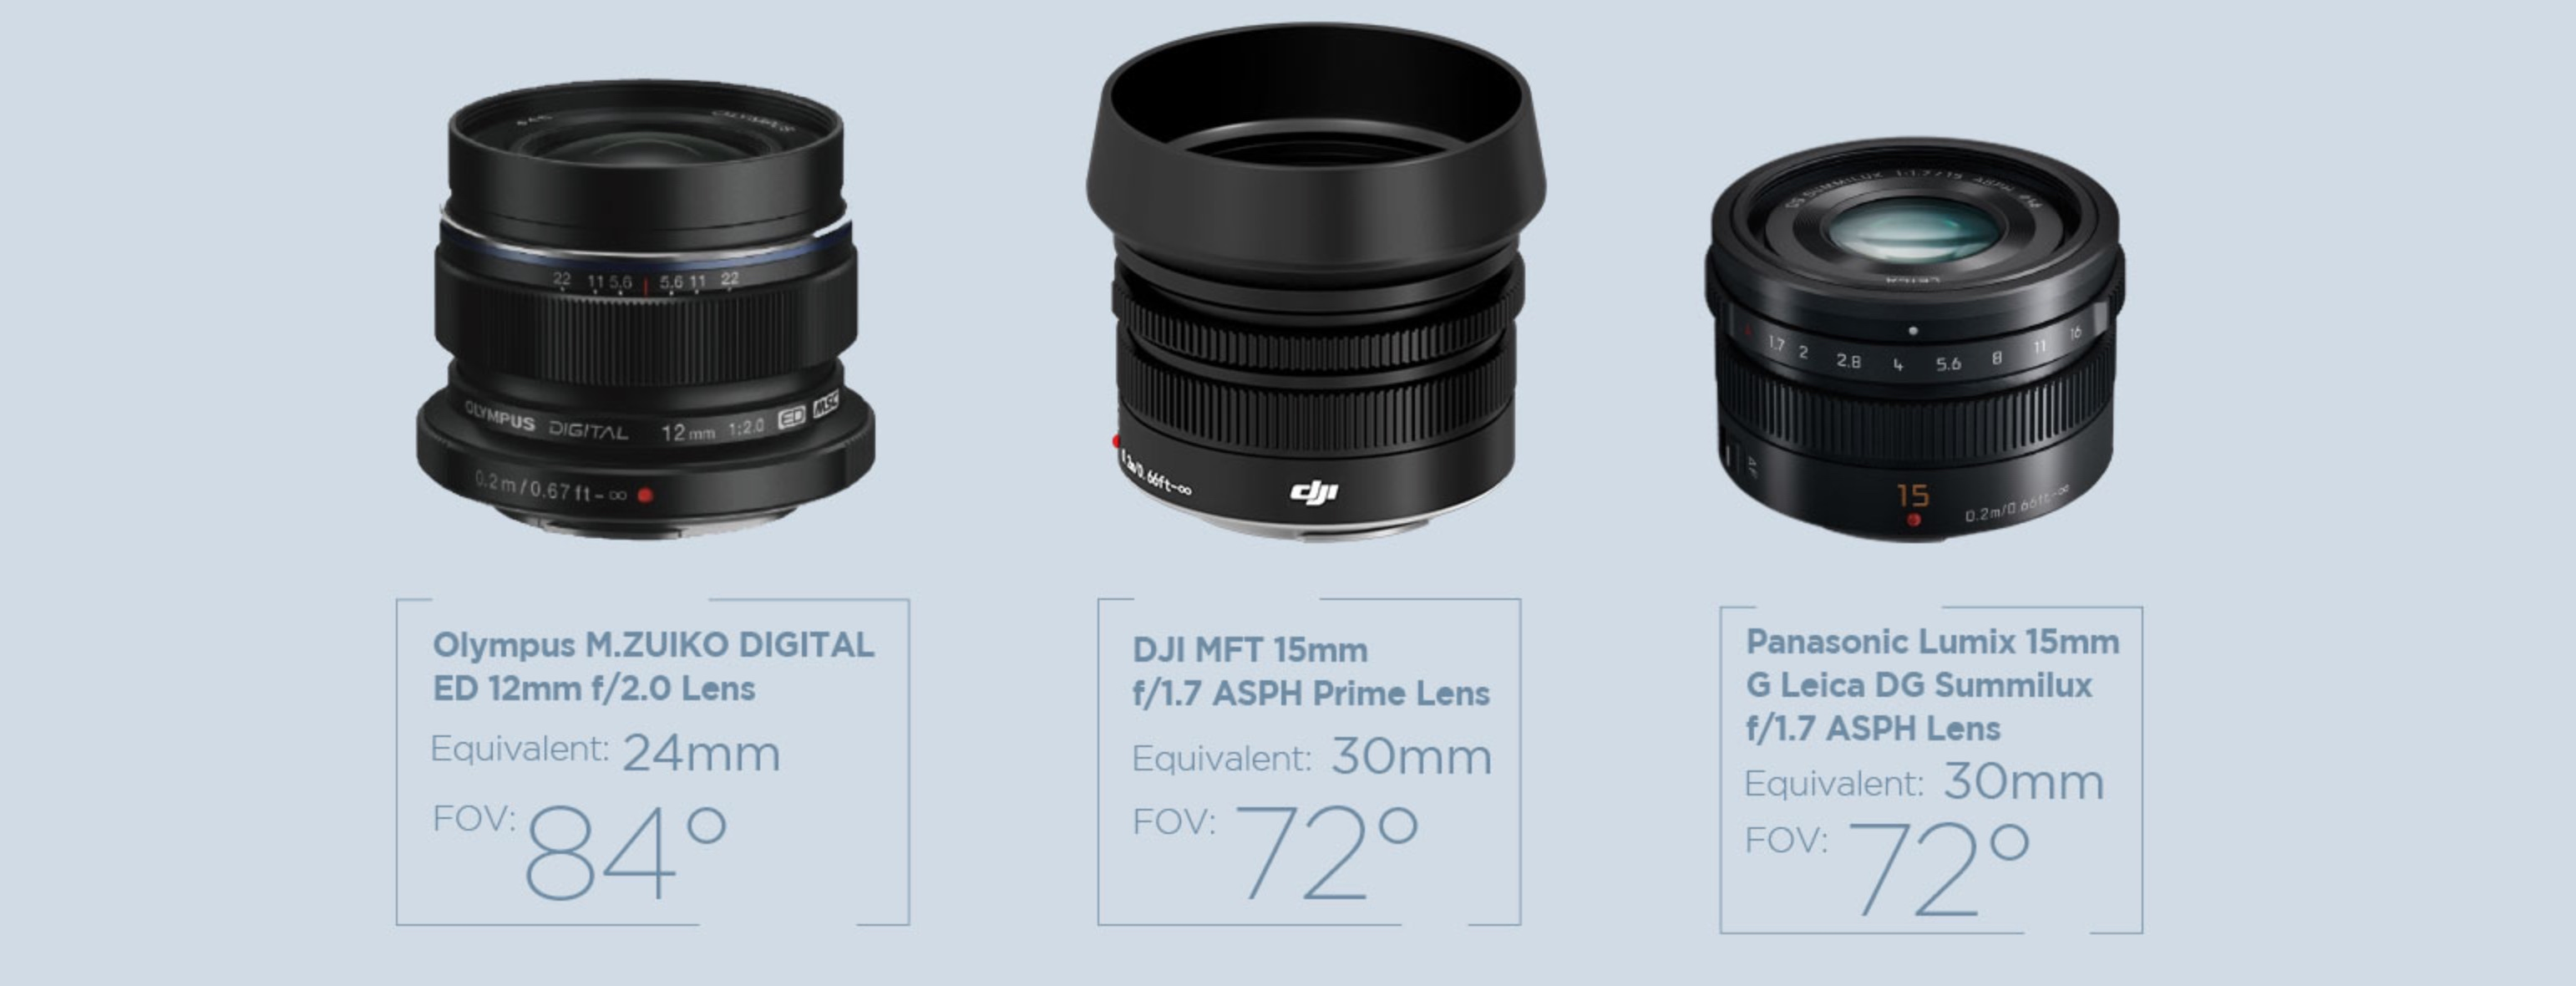 New X5 Inspire 1 Cameras From Dji Paul Joy Freelance Filmmaker Pro Zenmuse 4k 3 Axis Professional Lenses